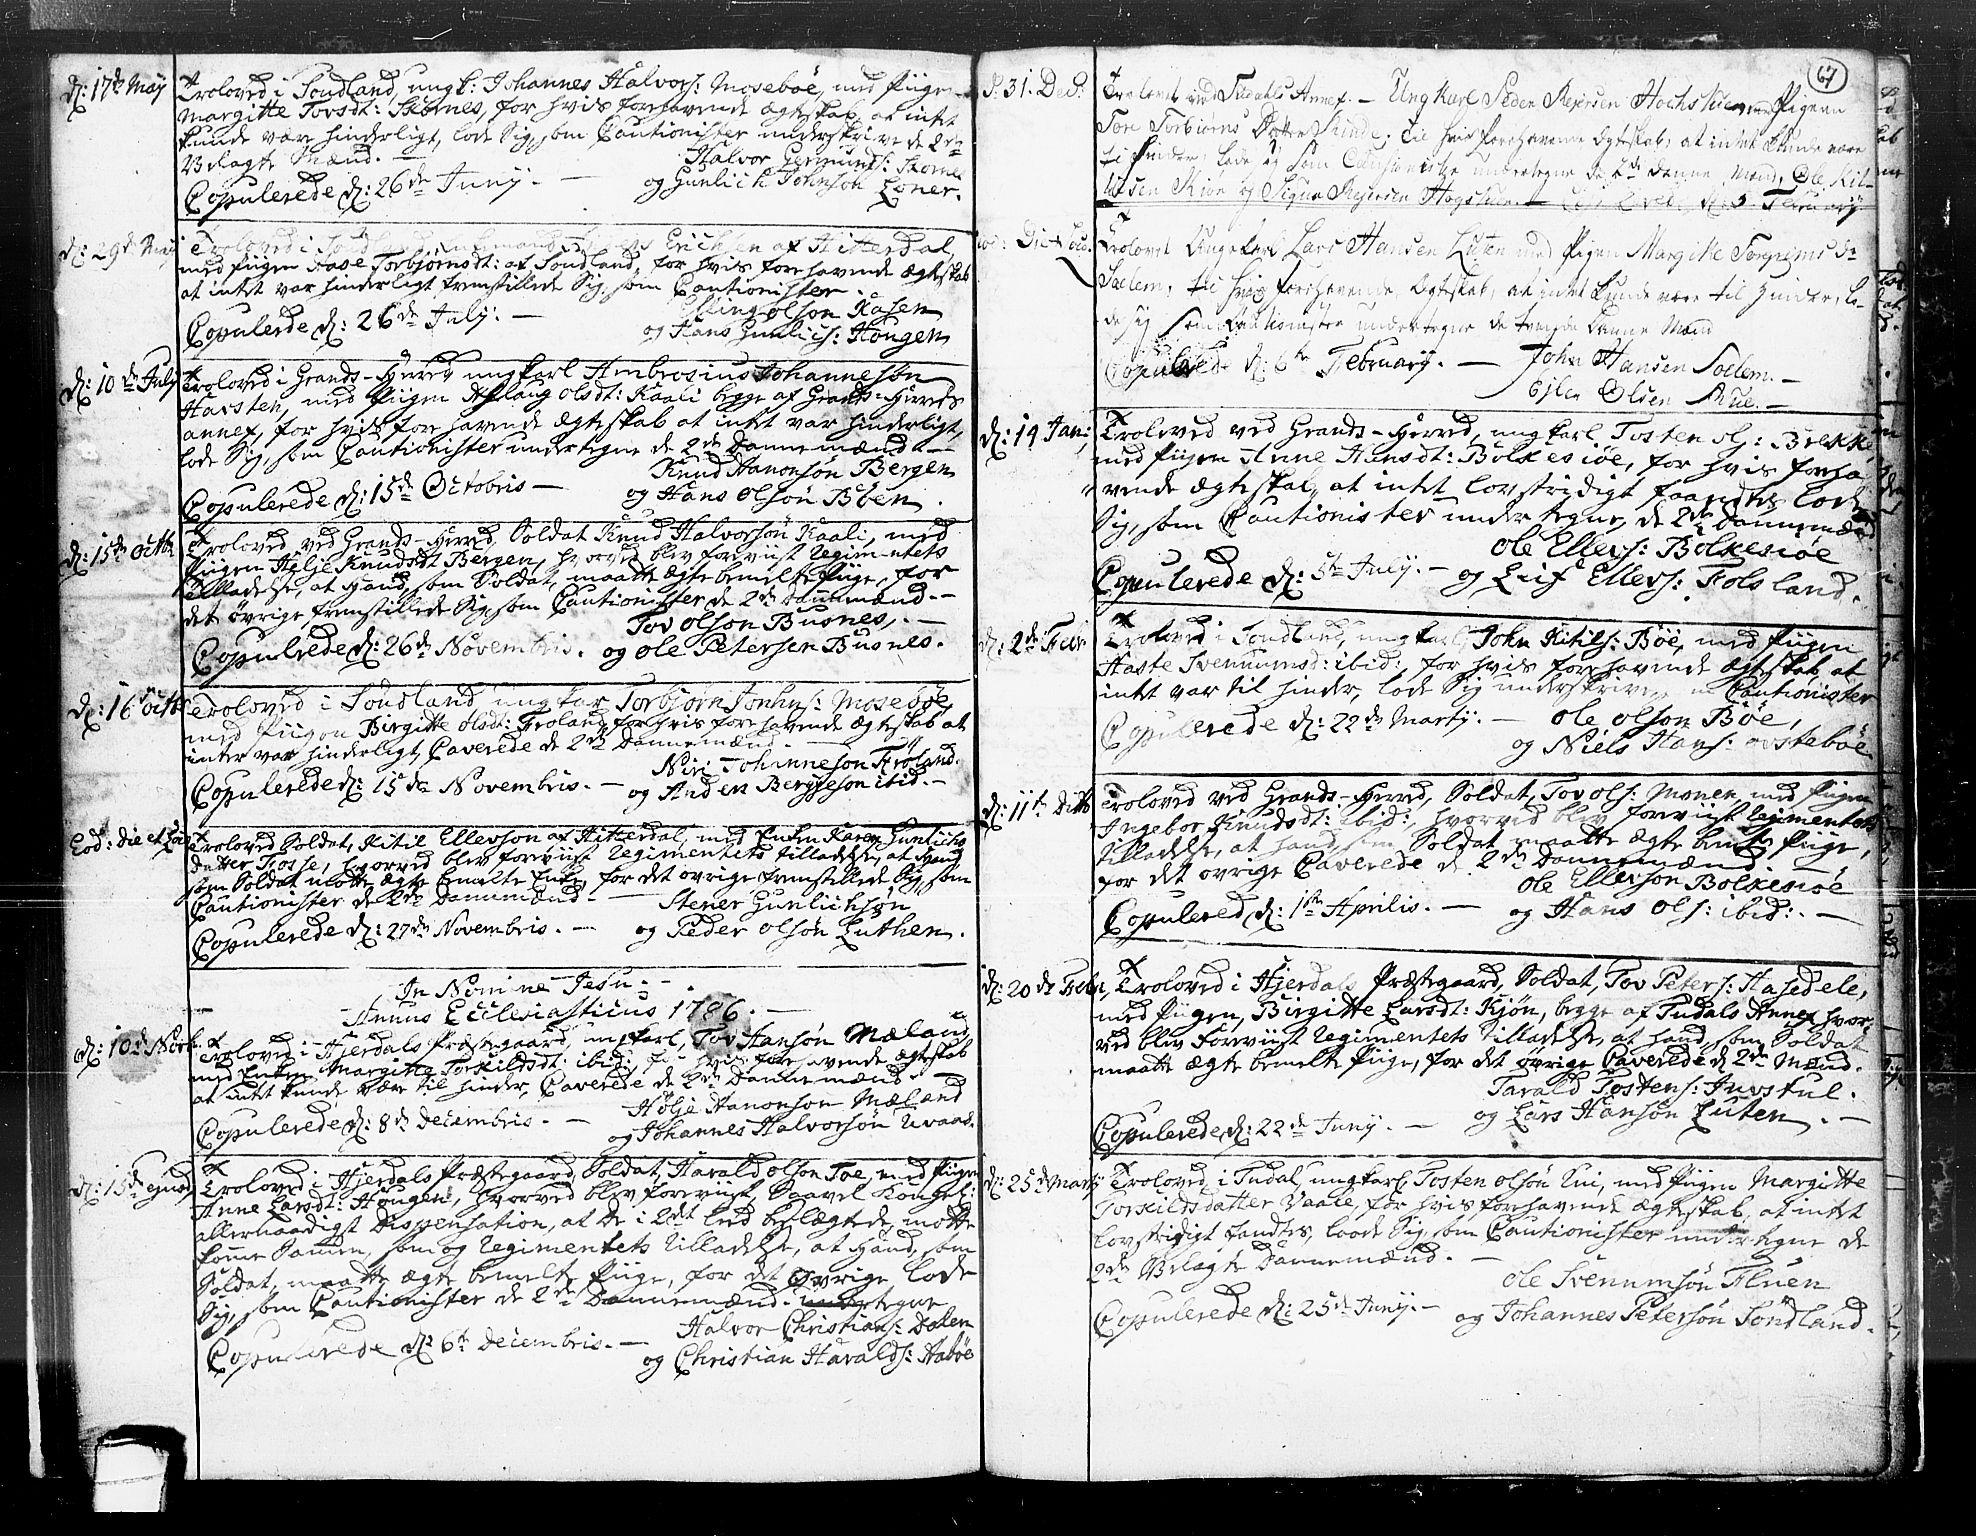 SAKO, Hjartdal kirkebøker, F/Fa/L0004: Ministerialbok nr. I 4, 1727-1795, s. 67